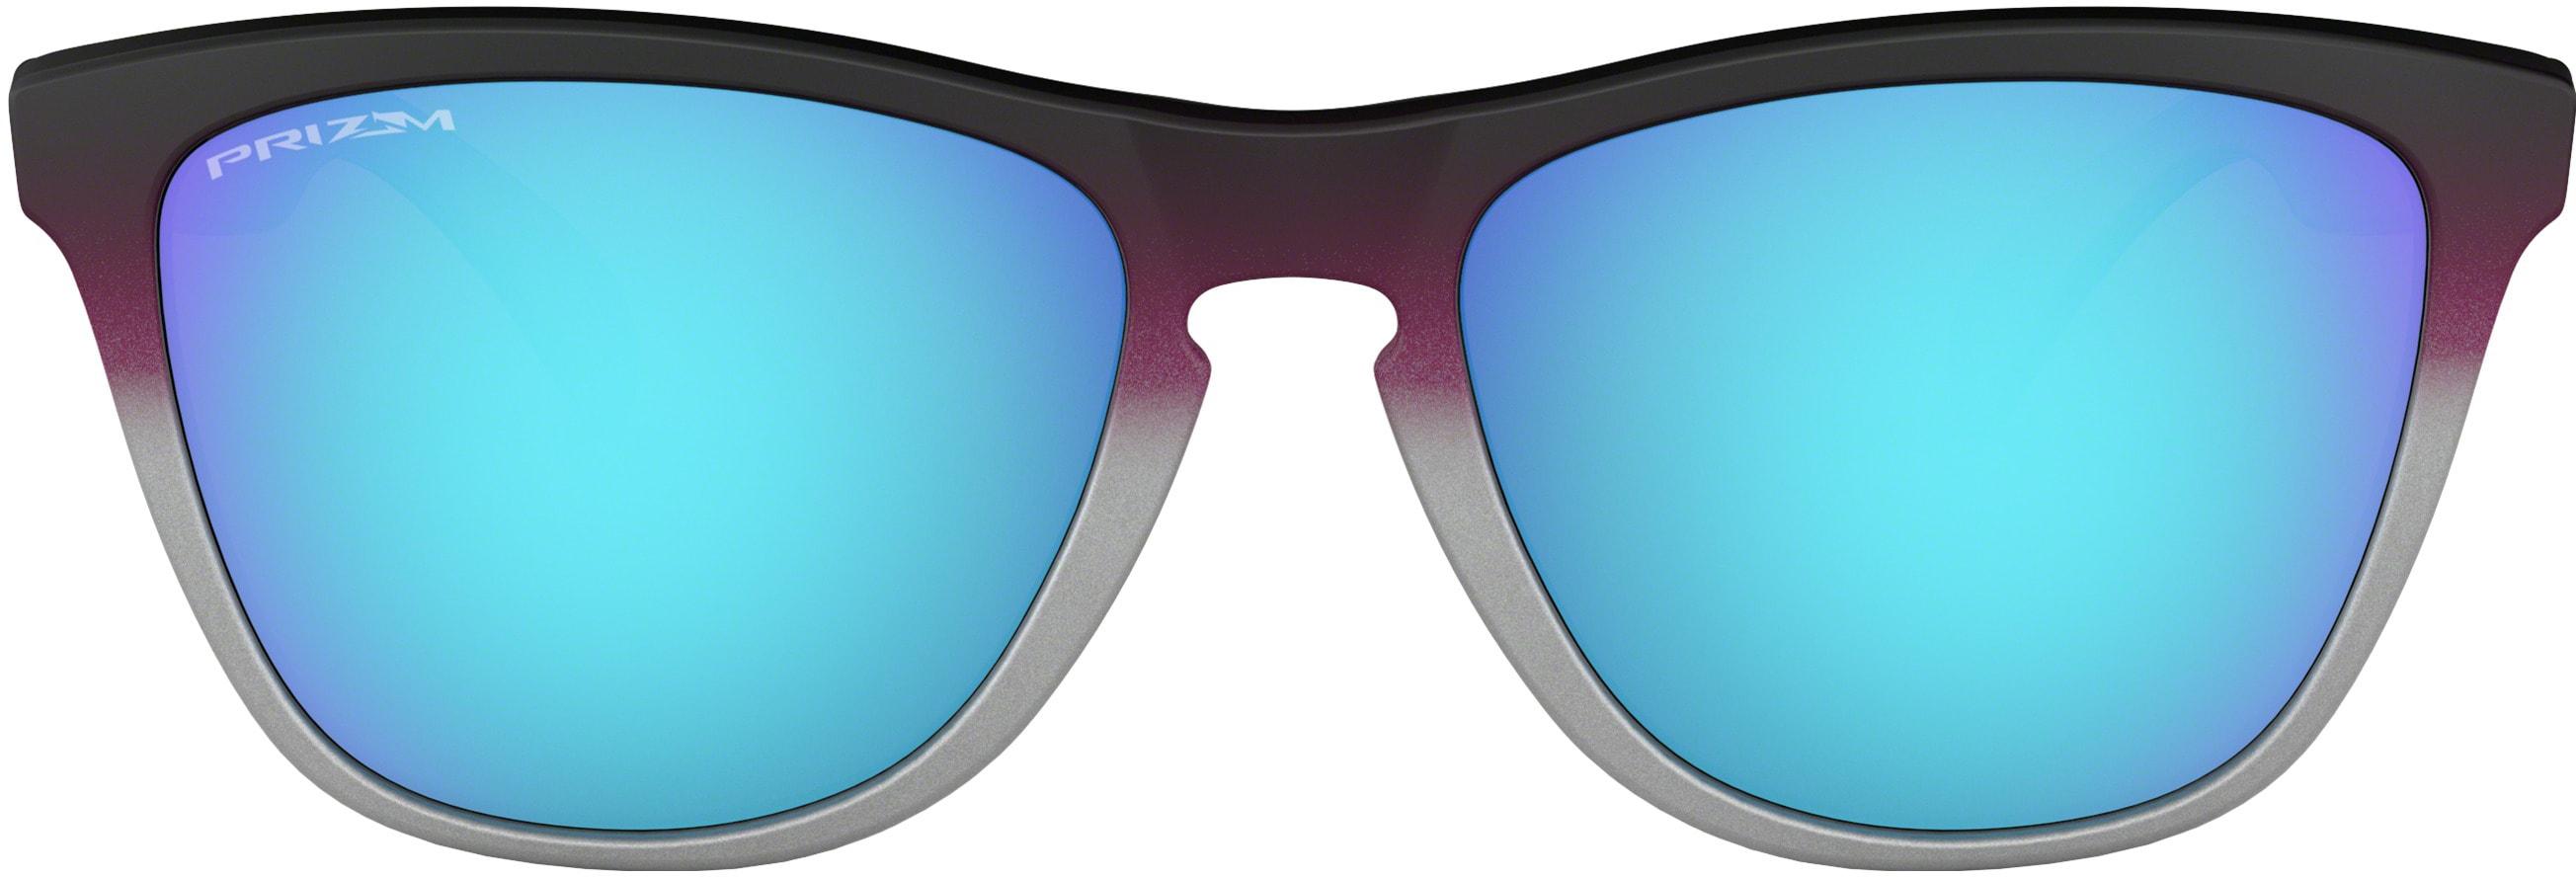 cdd35df746 Oakley Frogskins Splatterfade Collection Sunglasses - thumbnail 2